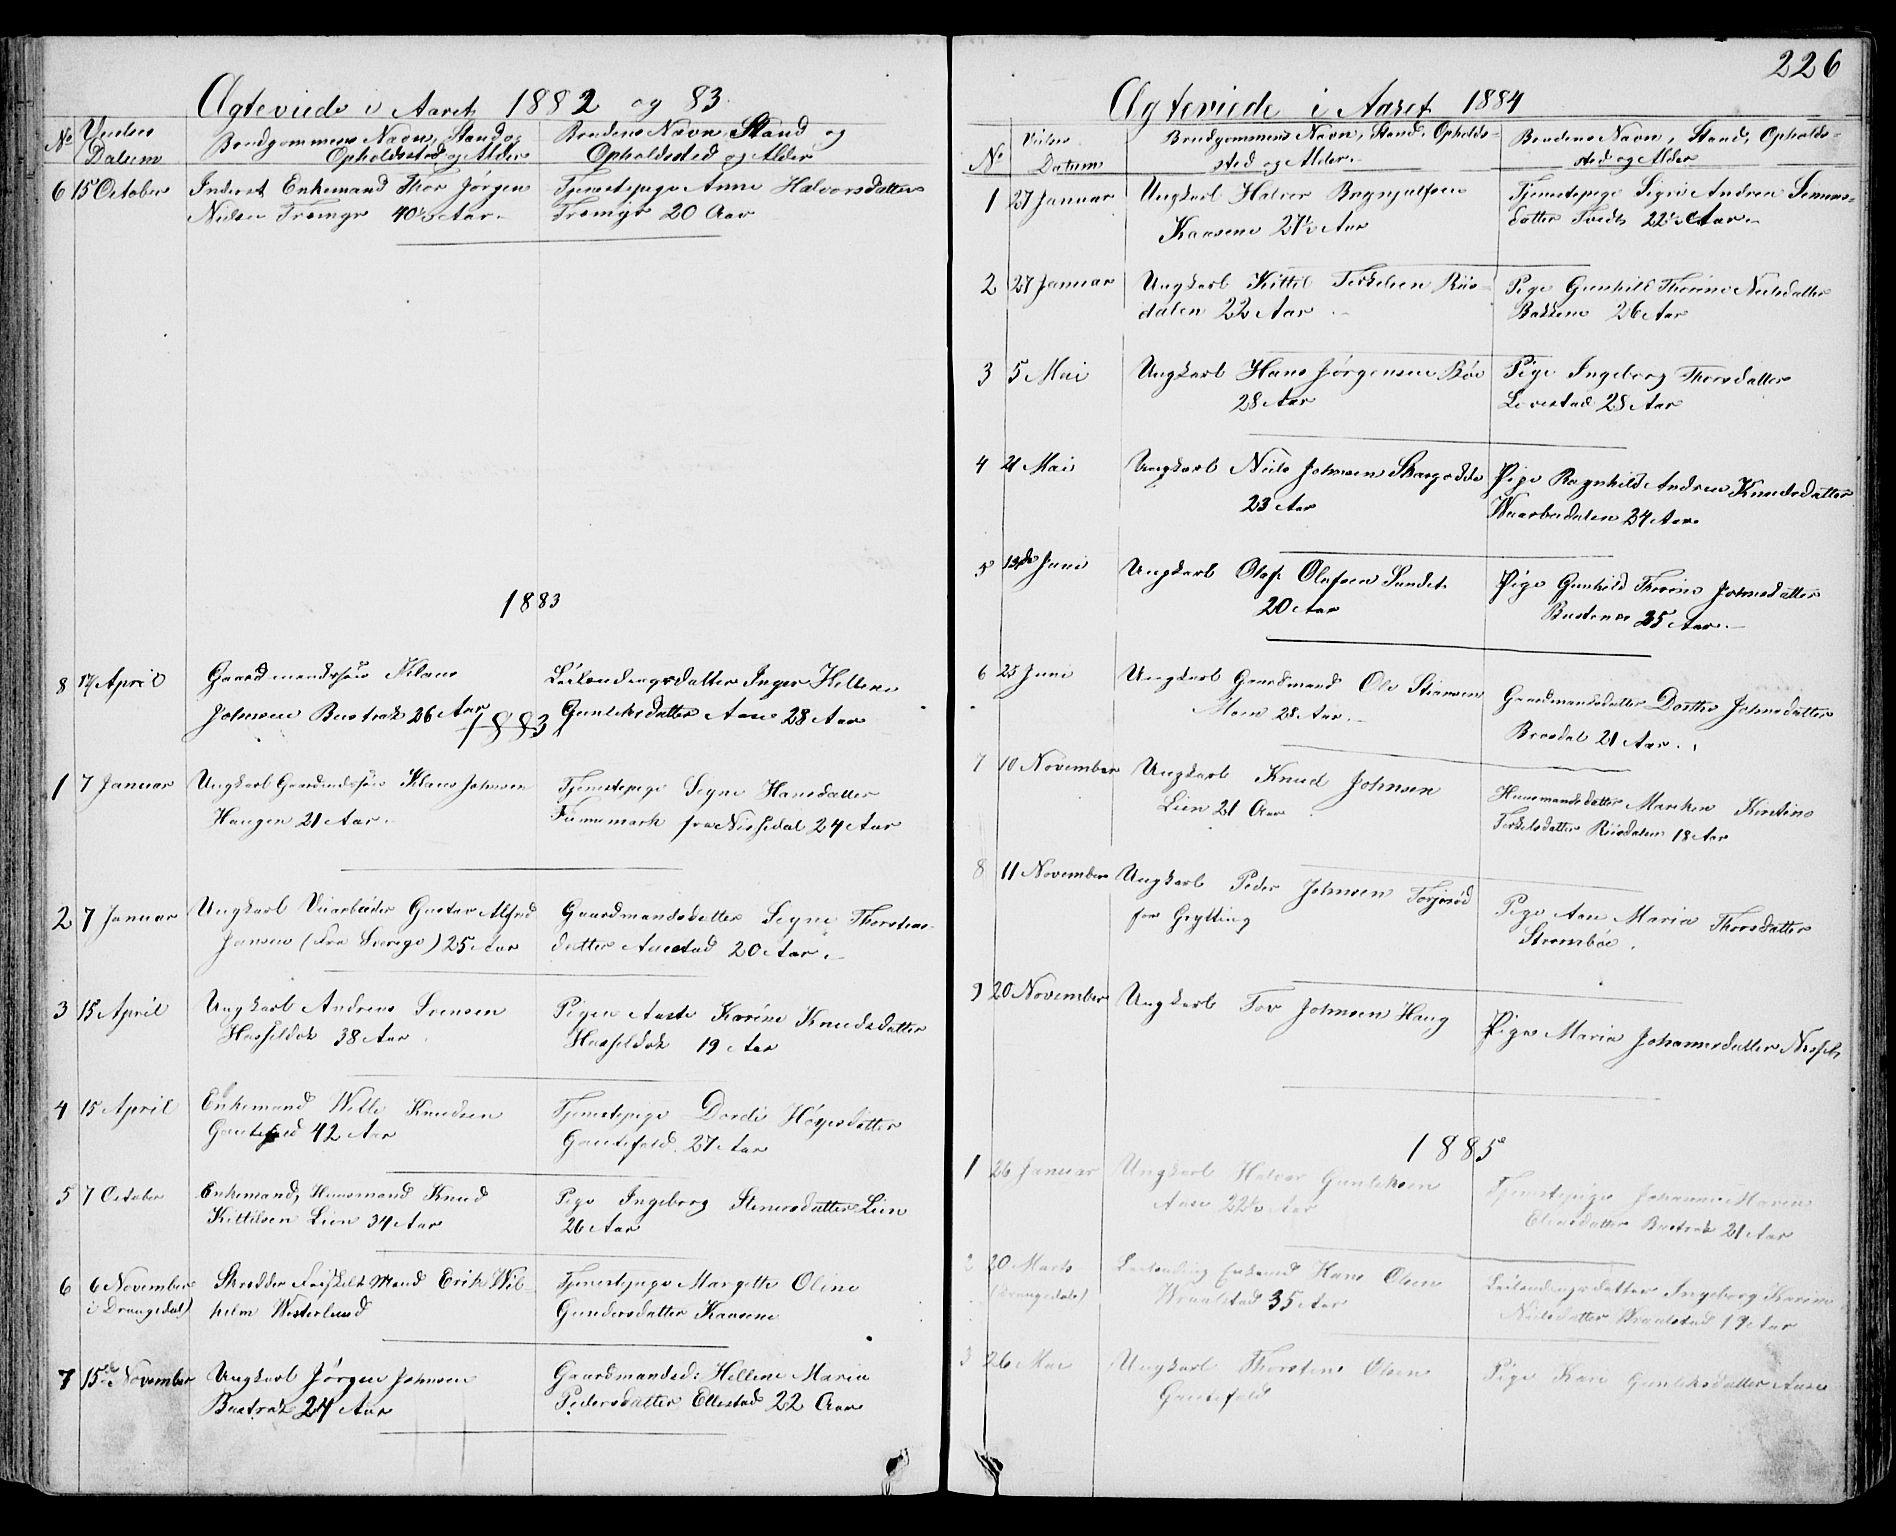 SAKO, Drangedal kirkebøker, G/Gb/L0001: Klokkerbok nr. II 1, 1856-1894, s. 226